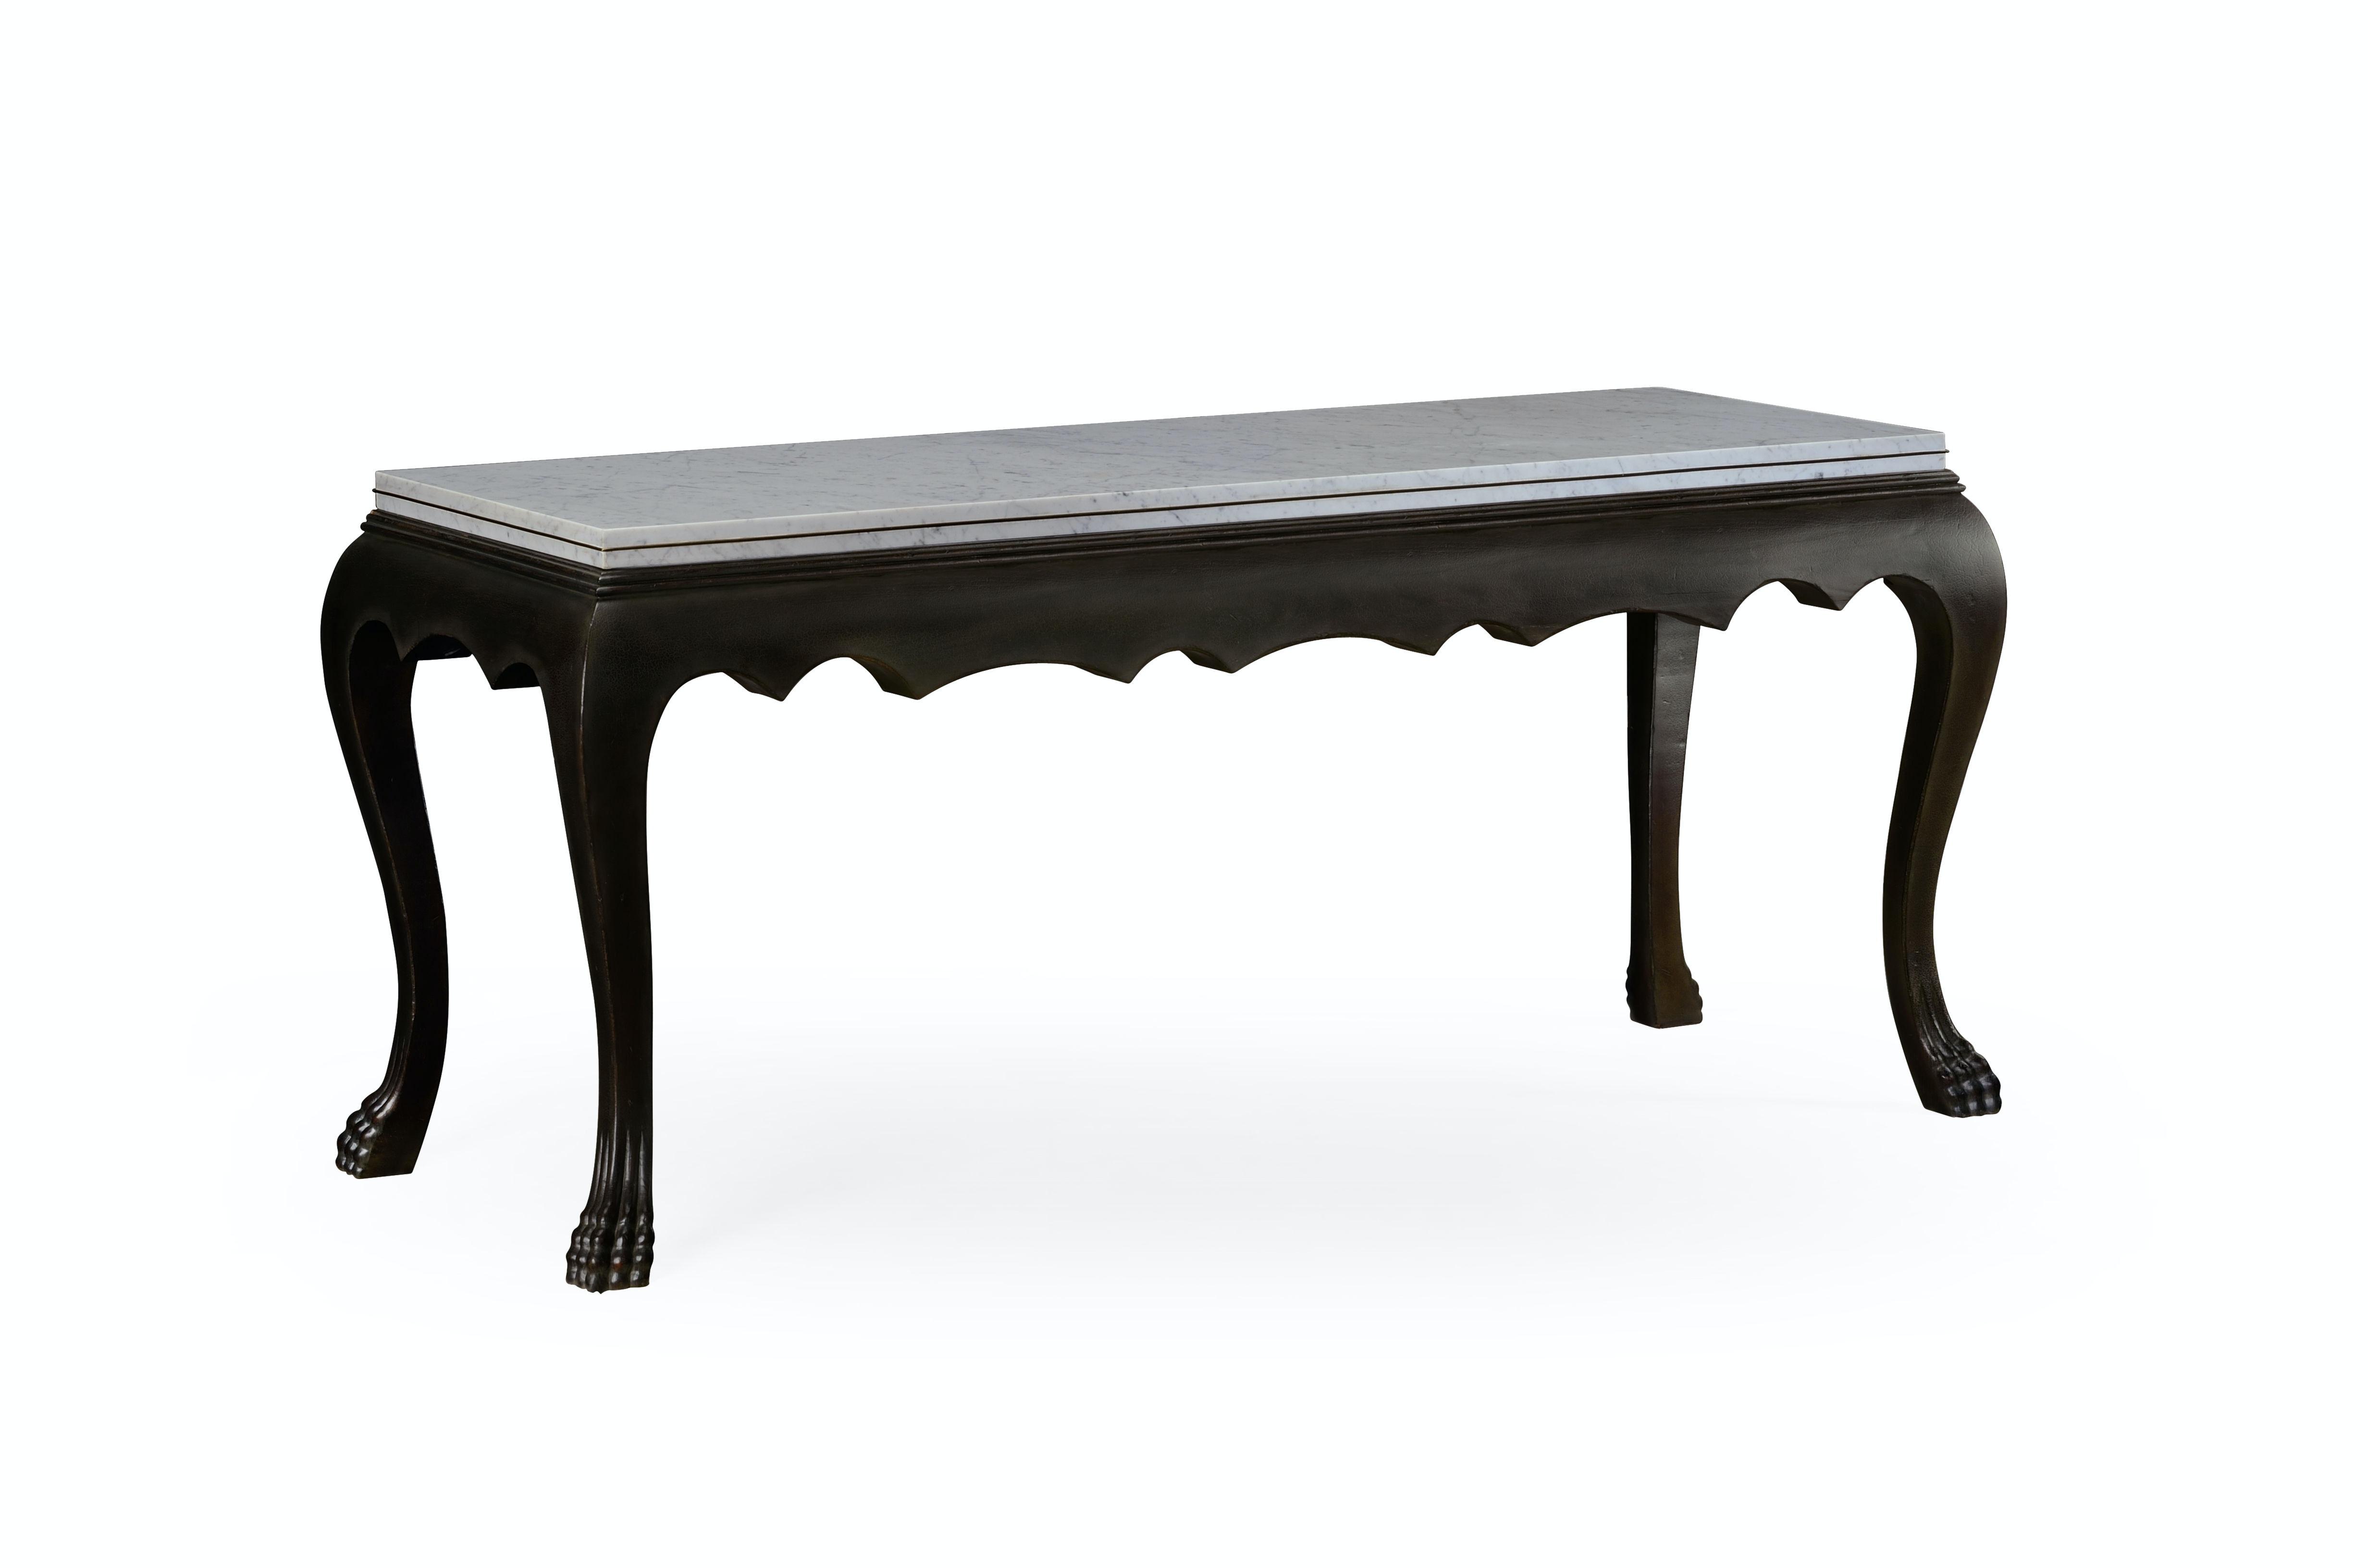 Jonathan charles living room eden table distressed oak 530011 edo at ridgemont furniture